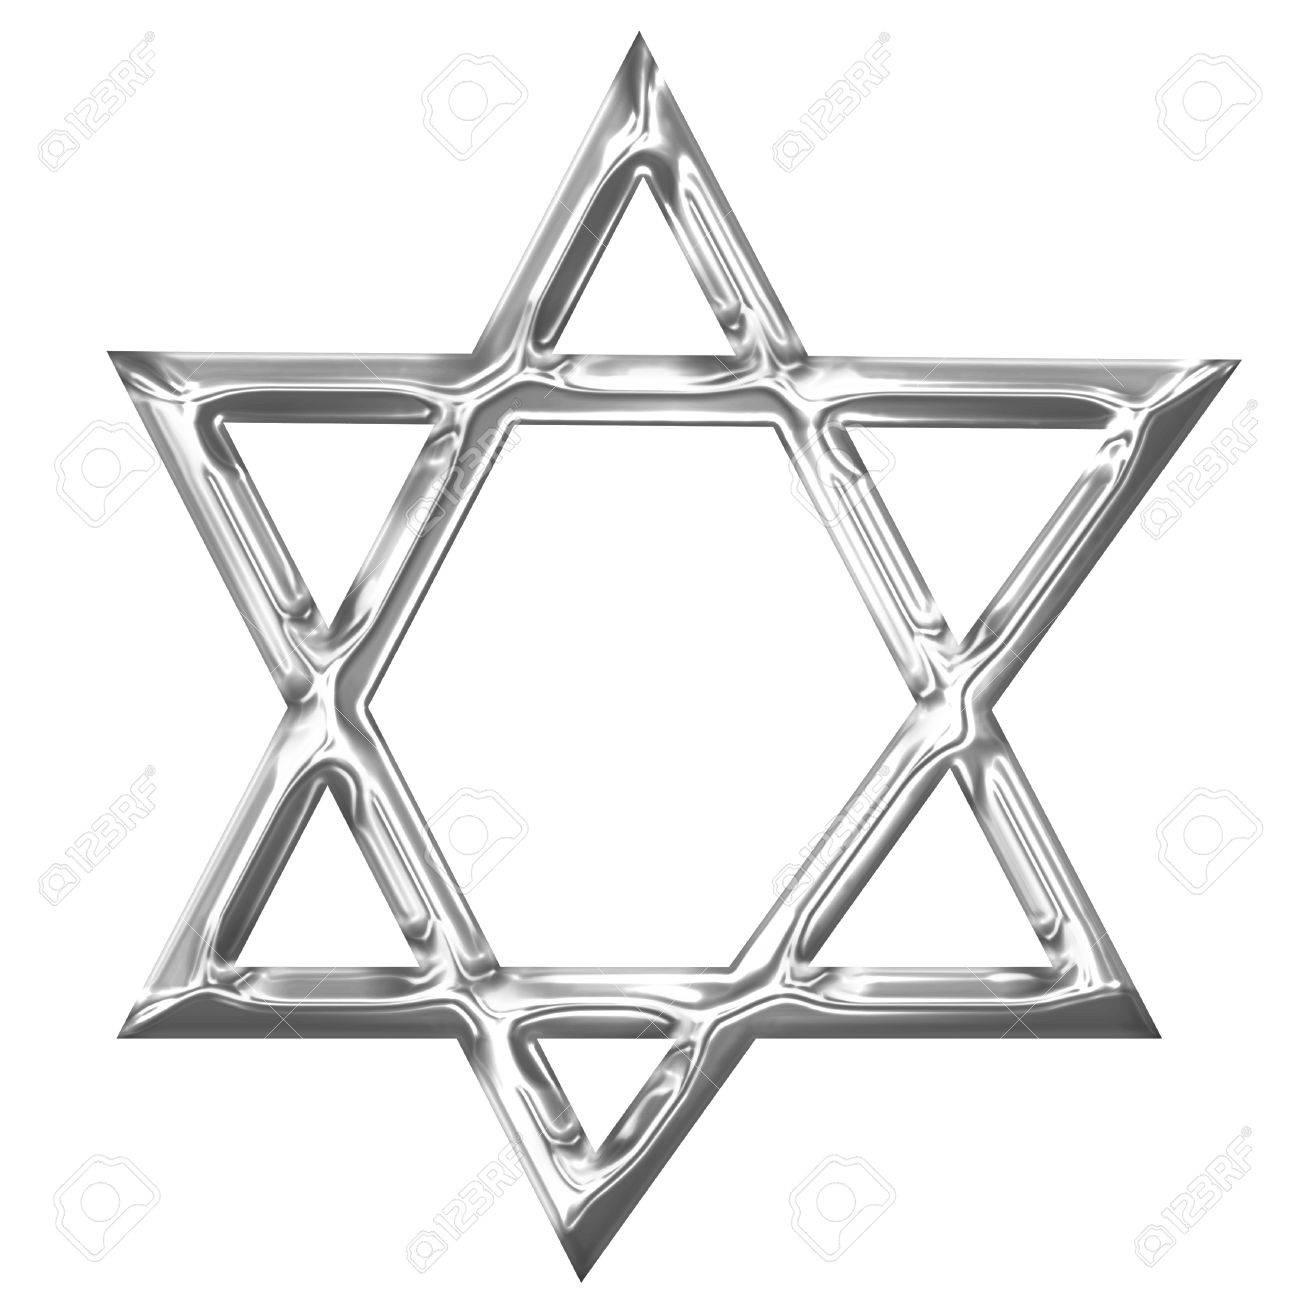 Christian Symbol And Jewish Symbol